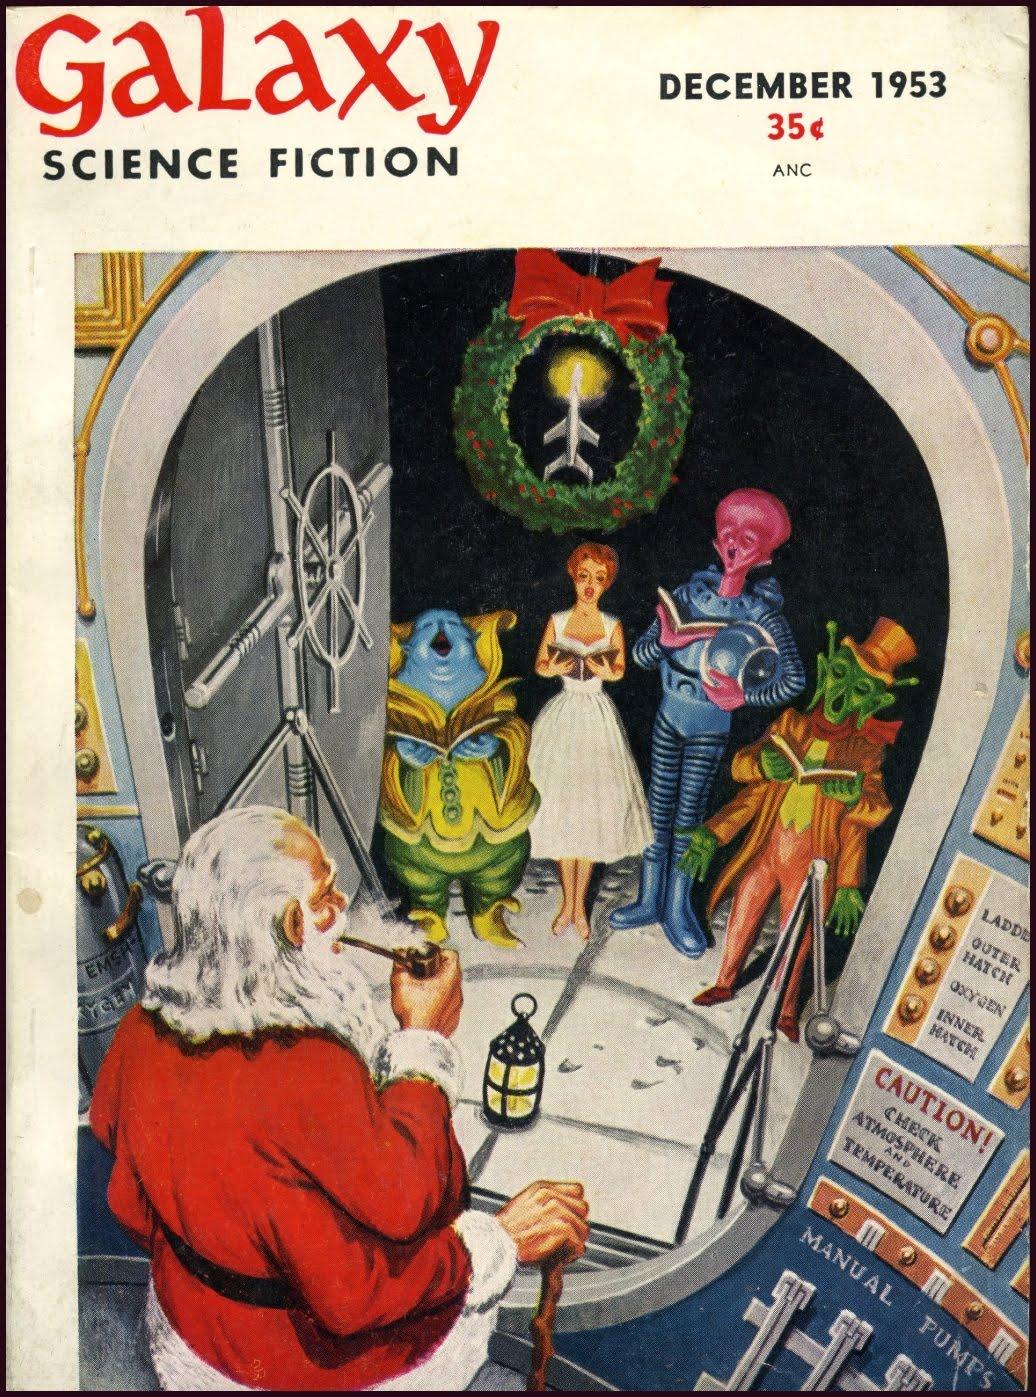 Figure 7: Galaxy Magazine December 1953